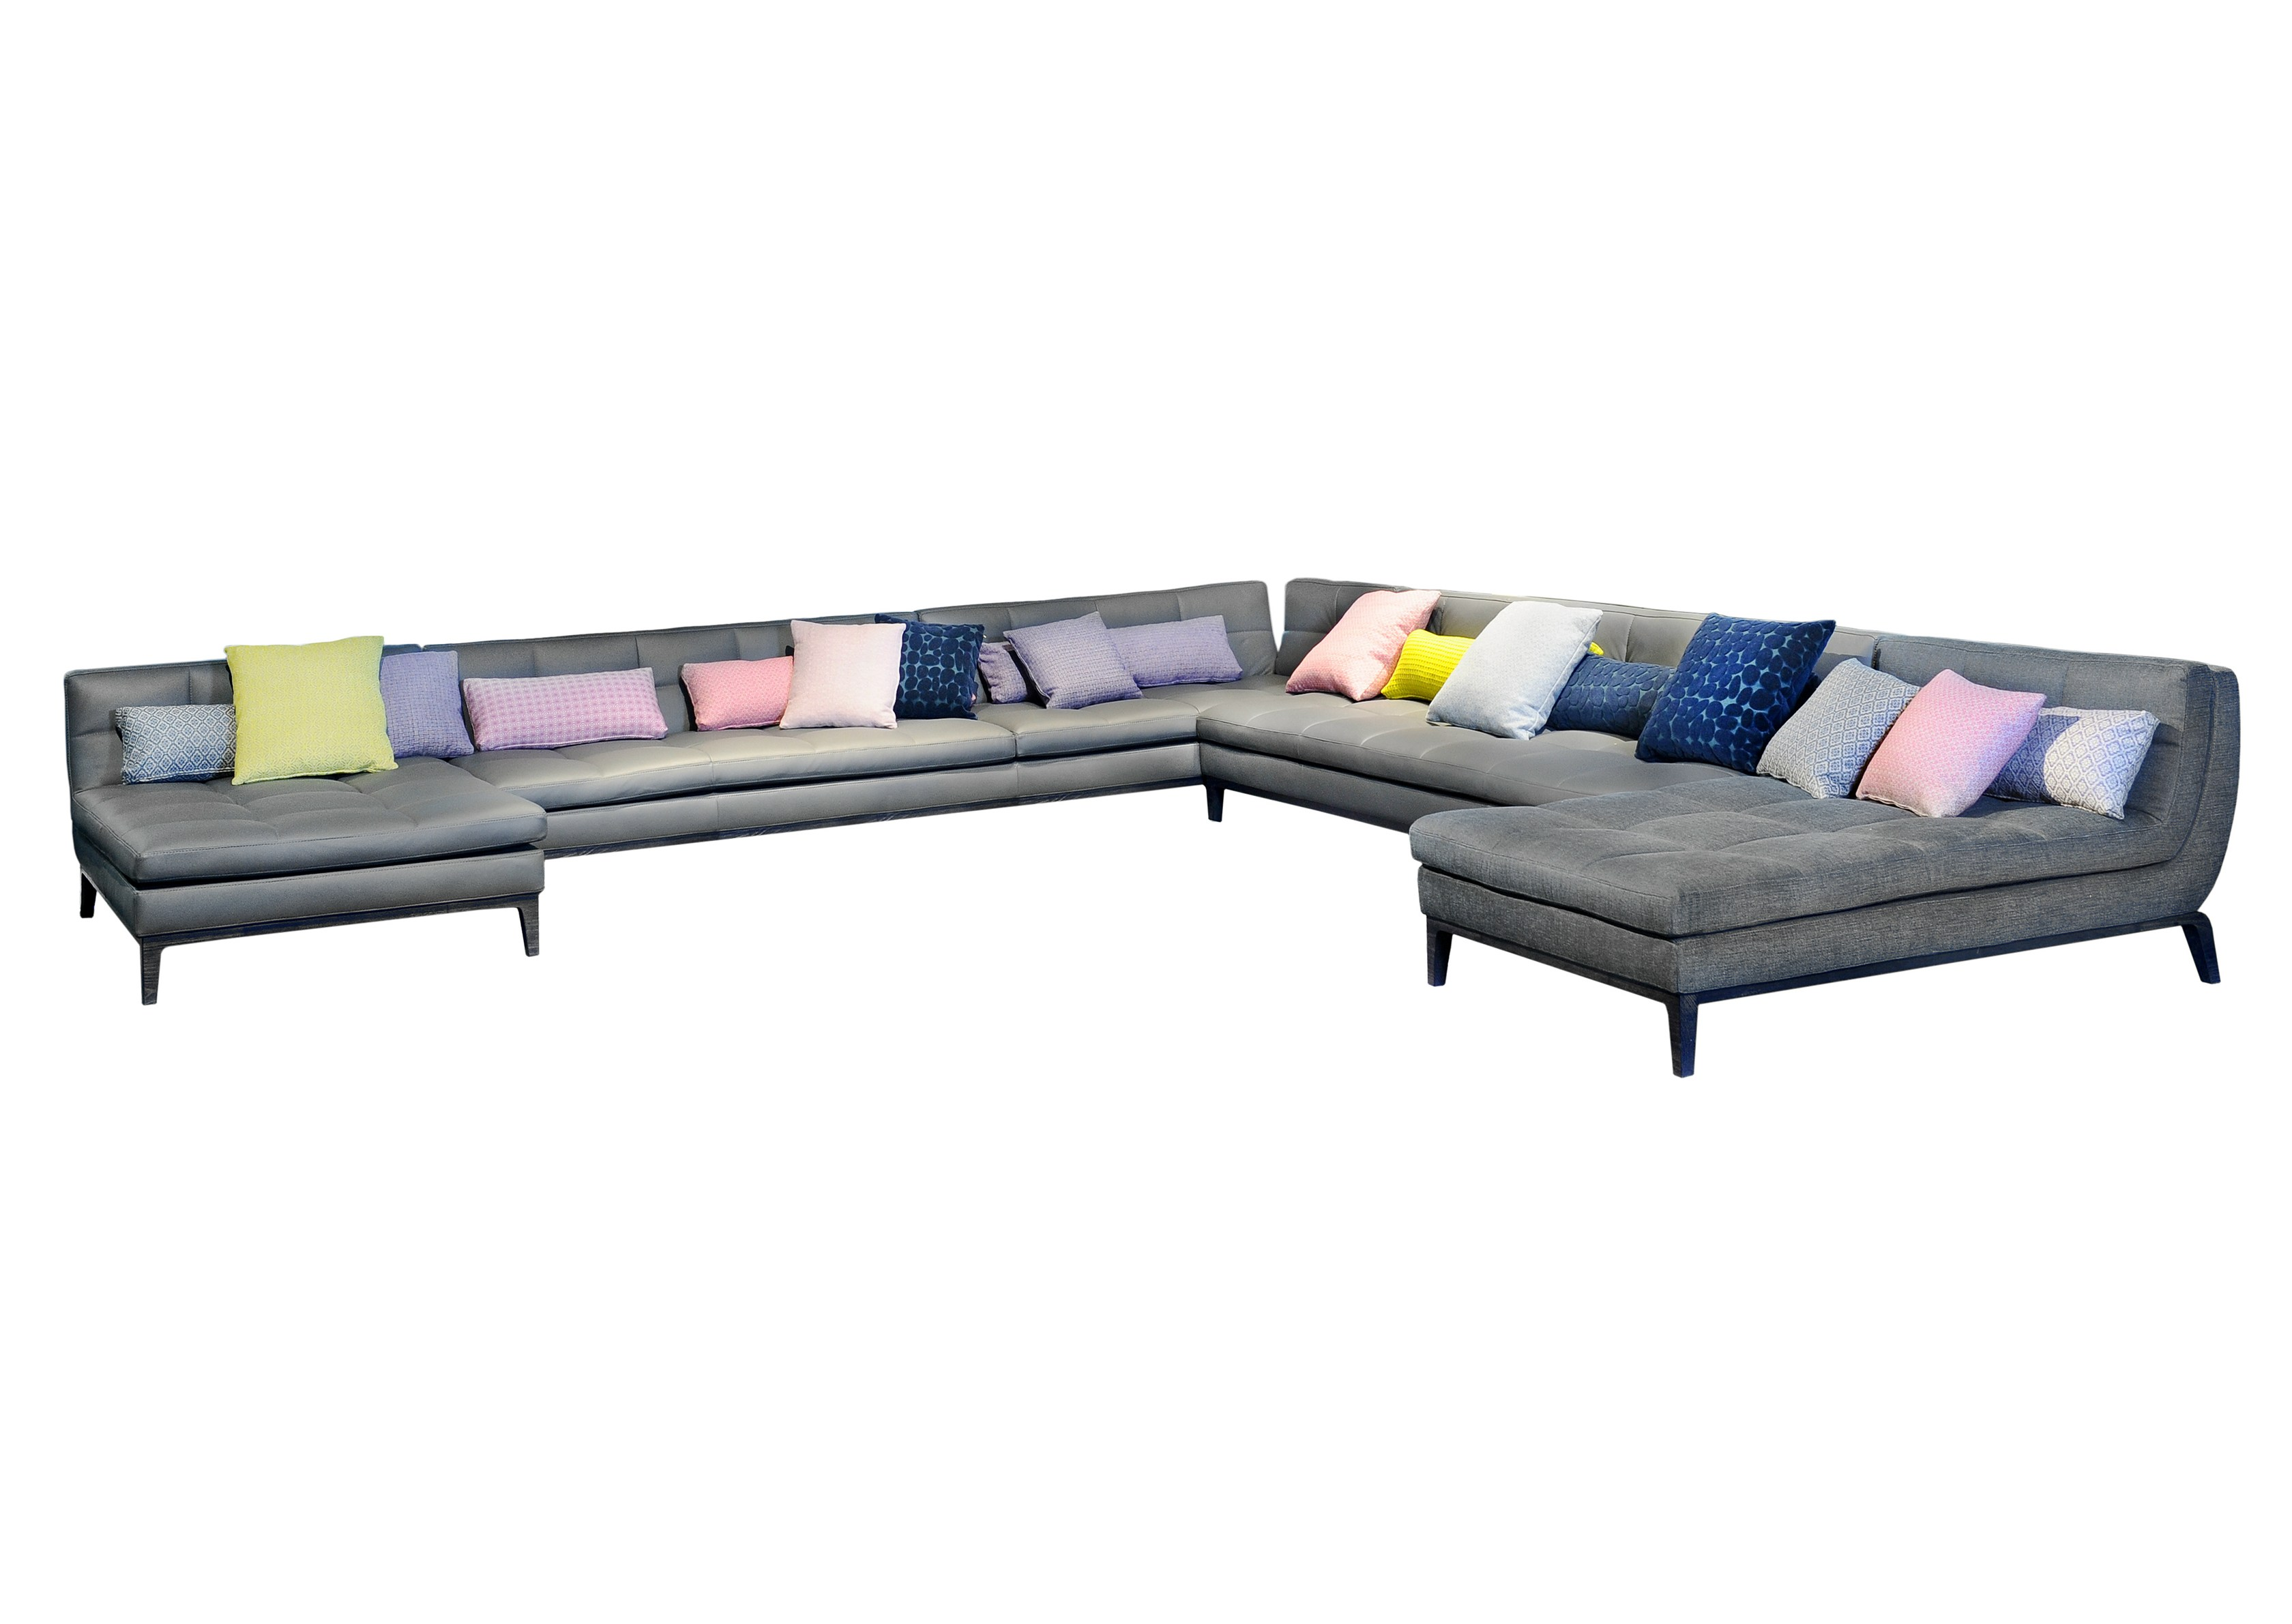 Corner upholstered sofa abstract by roche bobois design maurizio manzoni roberto tapinassi - Sofa rock en bobois ...